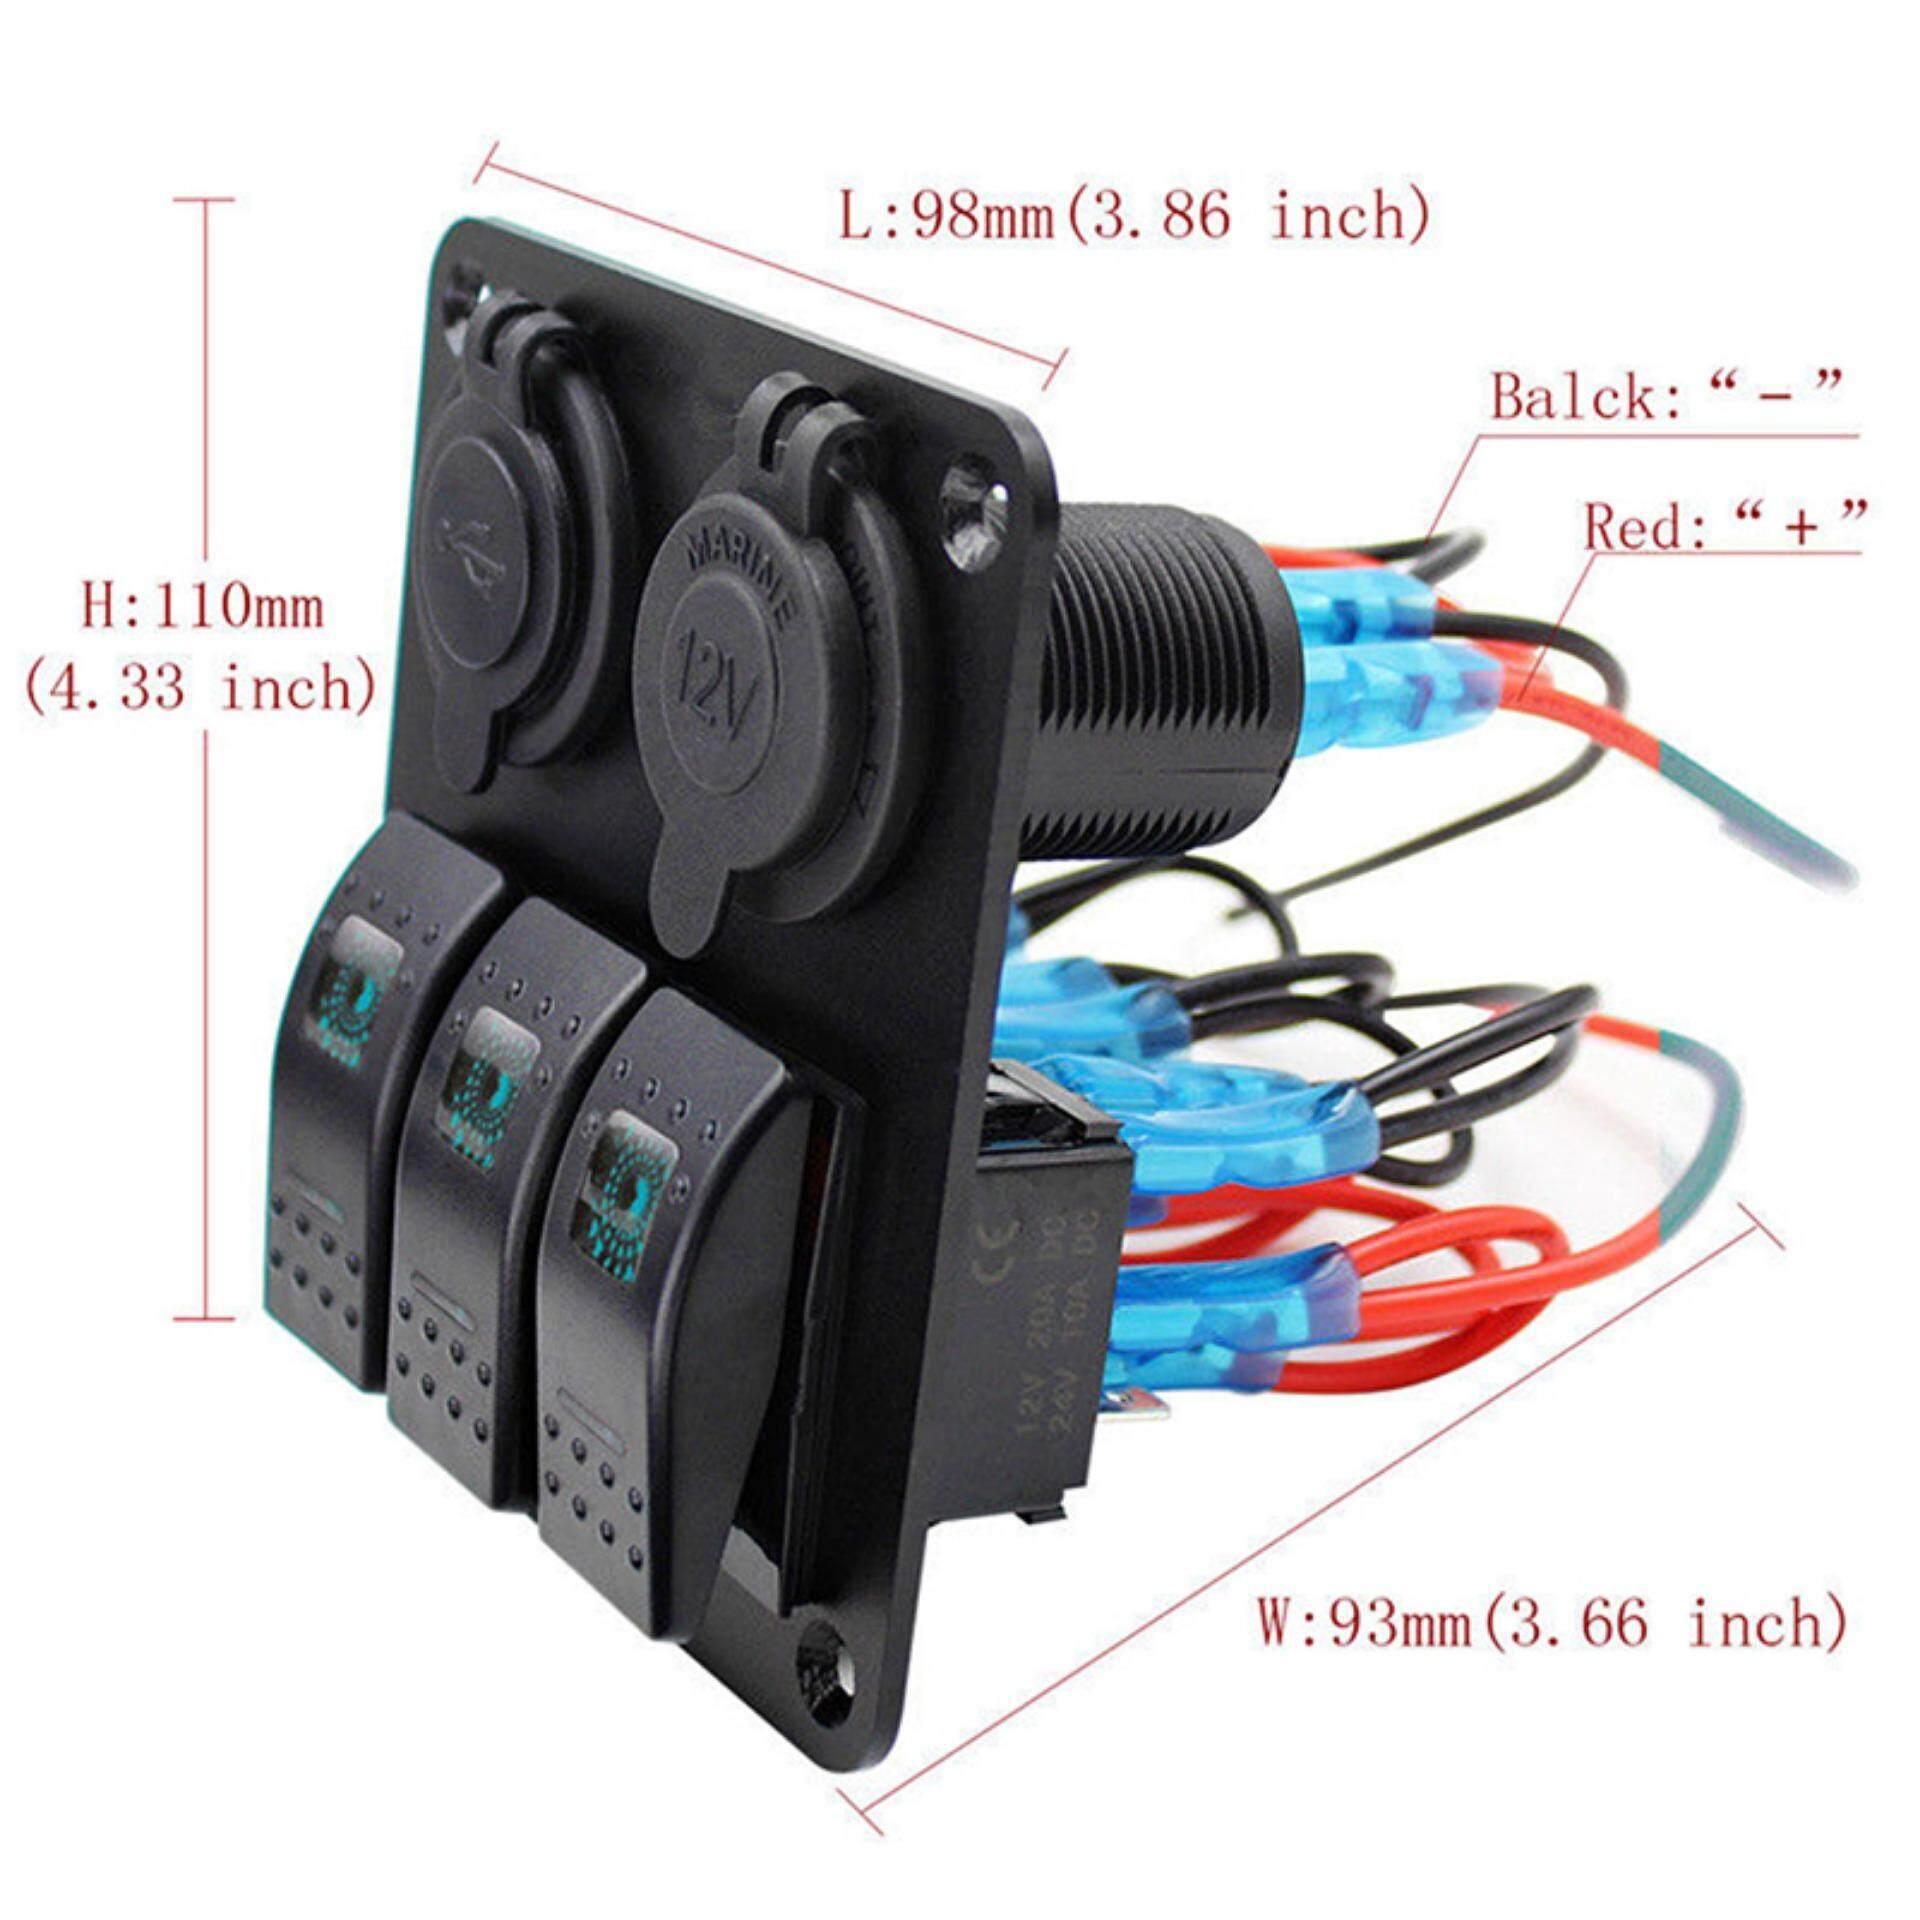 Other Electrical Switches 4 Gang Car Boat Marine LED 12V/24V USB Switch Panel Automotive Toggle Rocker